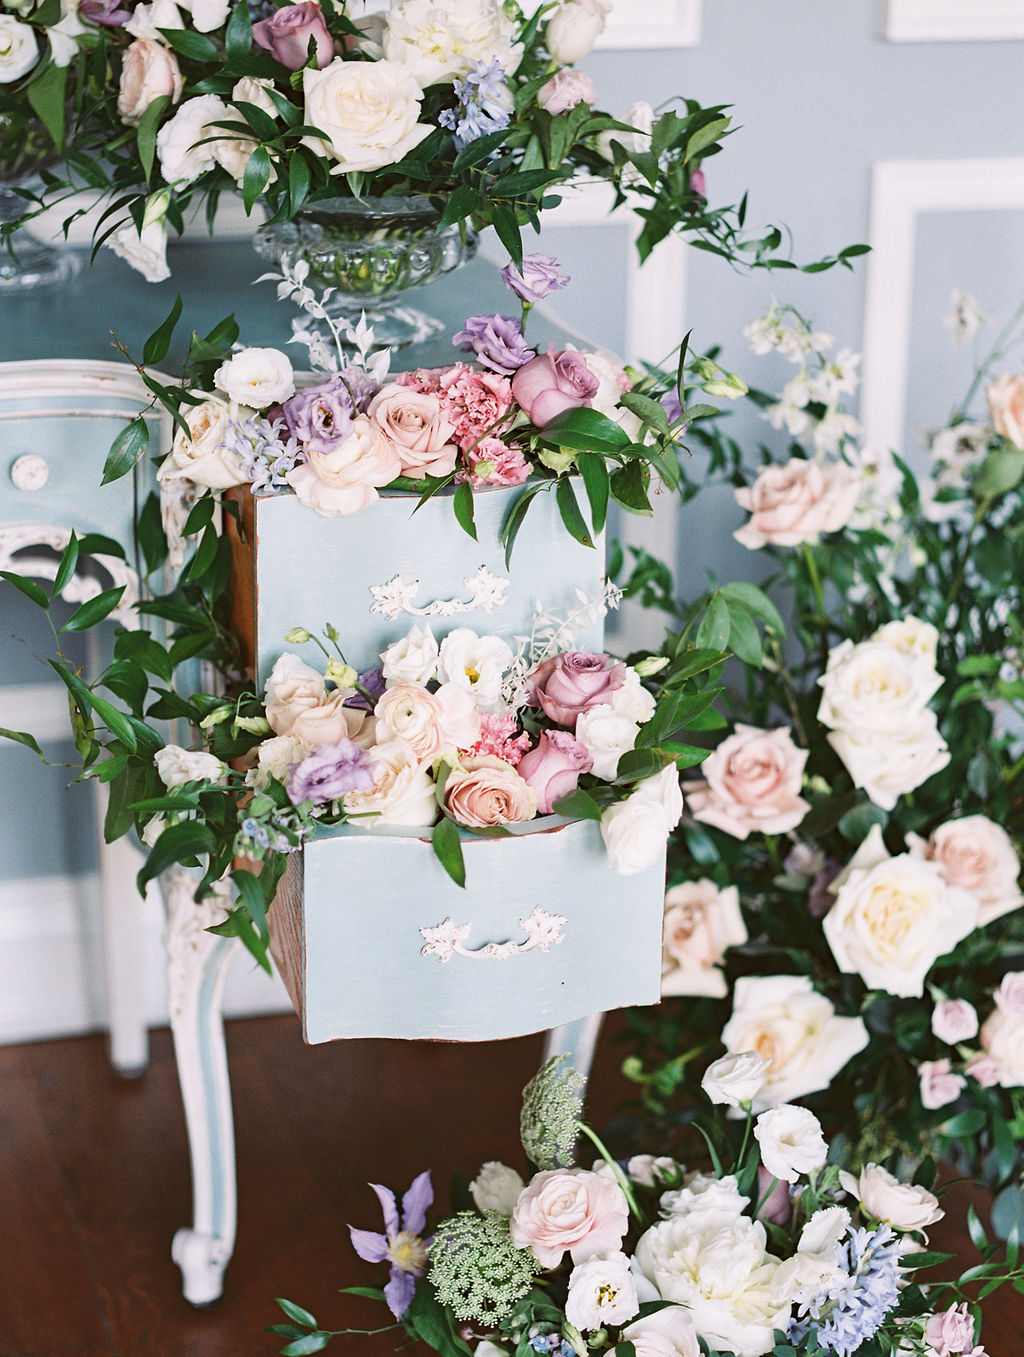 Romantic-French-Garden-WhitneyHeardPhotography-6011134-R1-E012